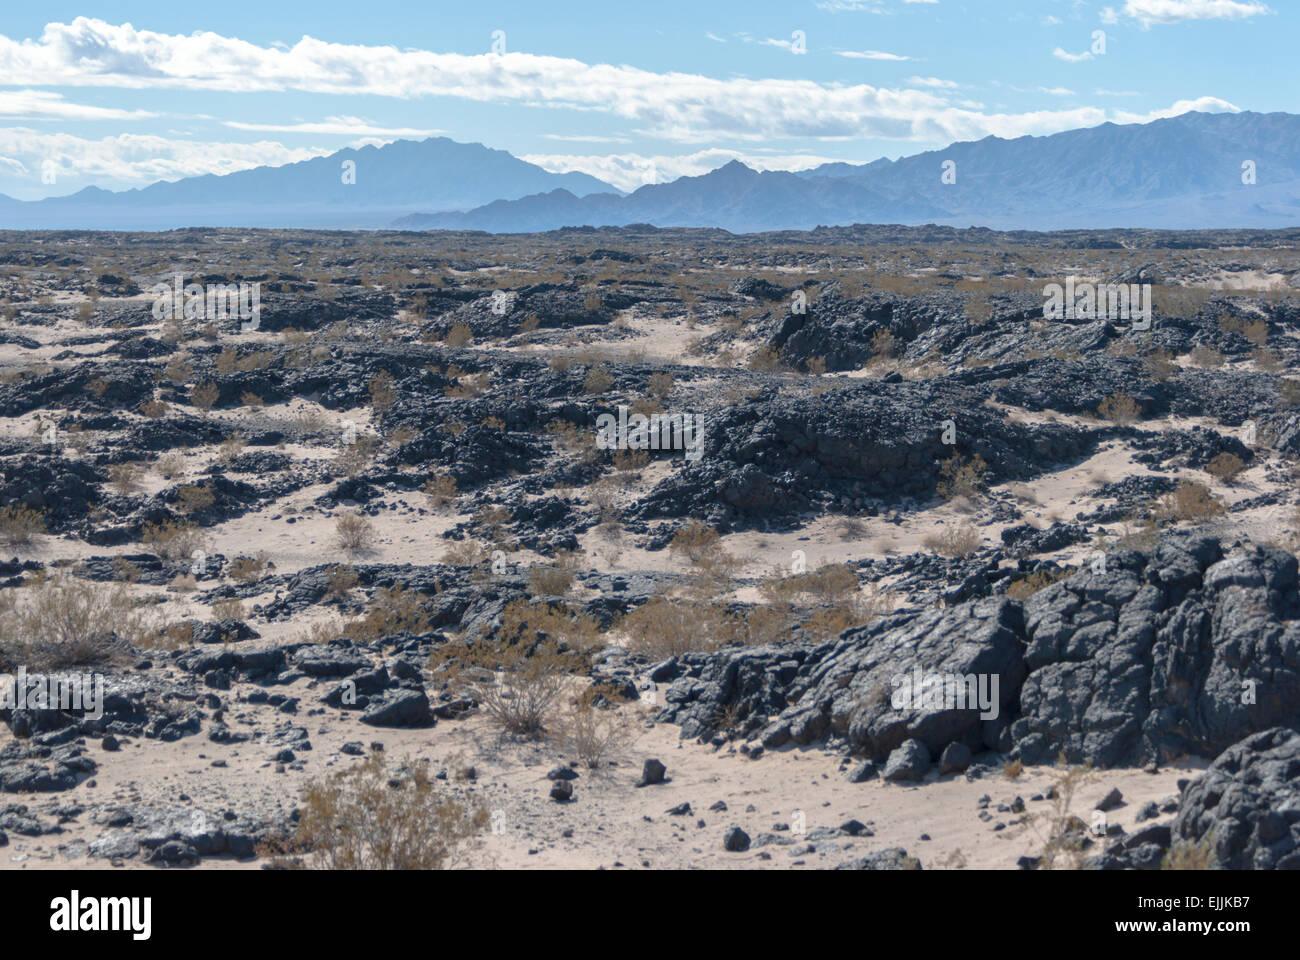 Lava Field Amboy California. - Stock Image